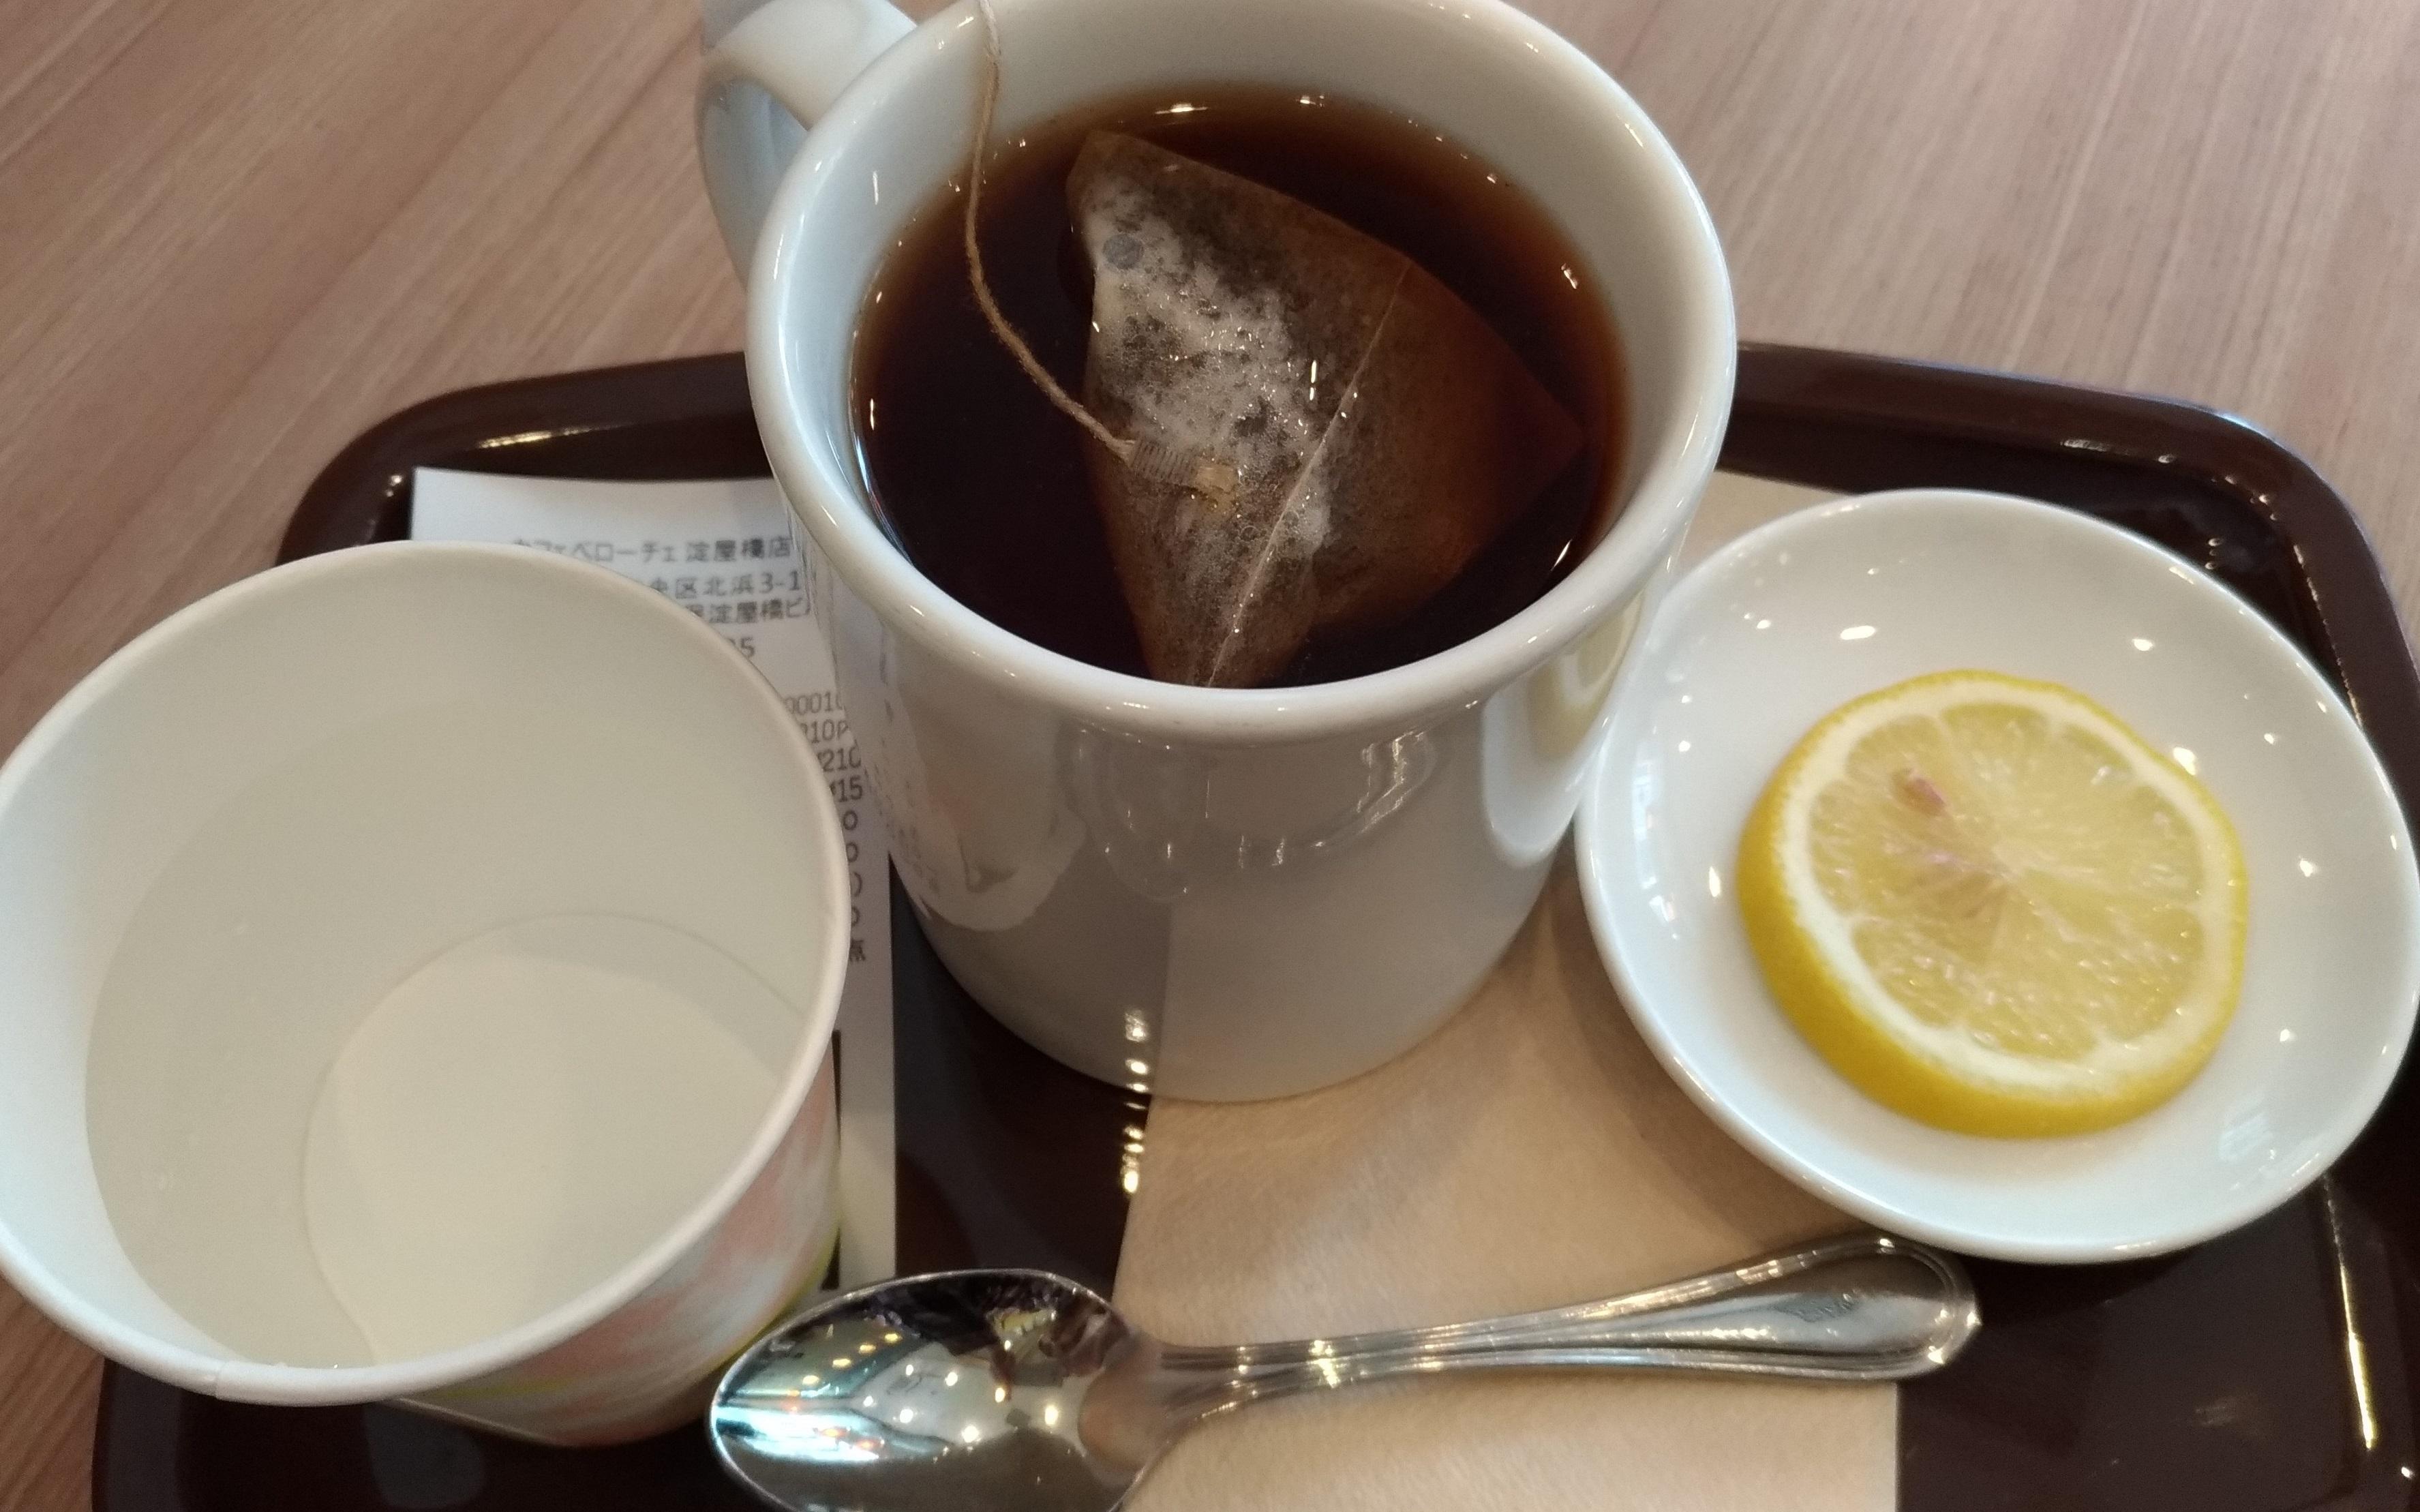 osaka_cafe_black_tea.jpg